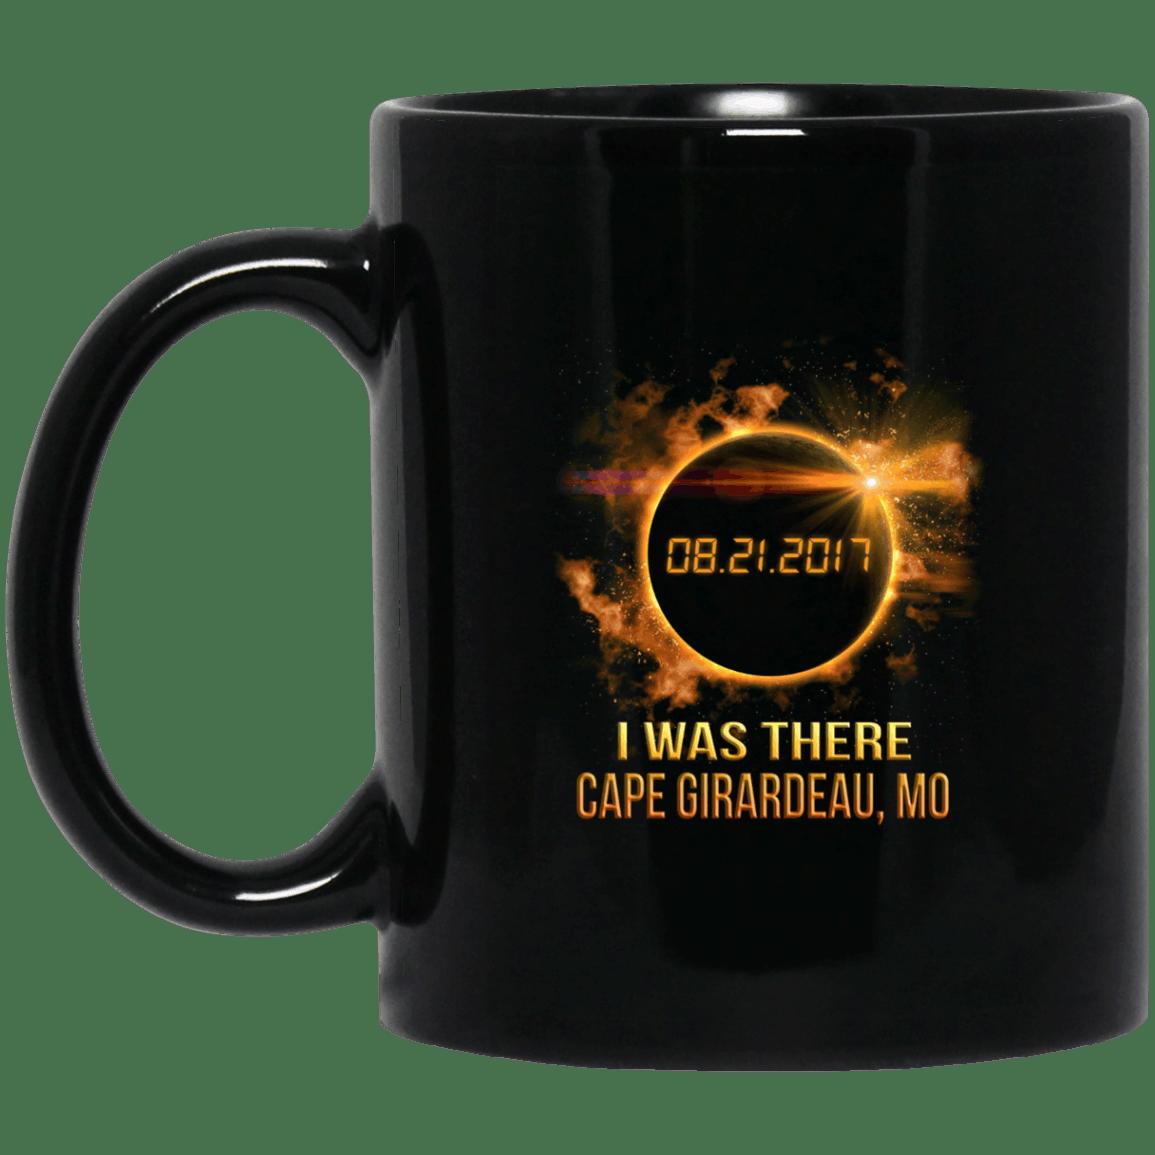 I was there cape girardeau missouri total solar eclipse 08212017 mug